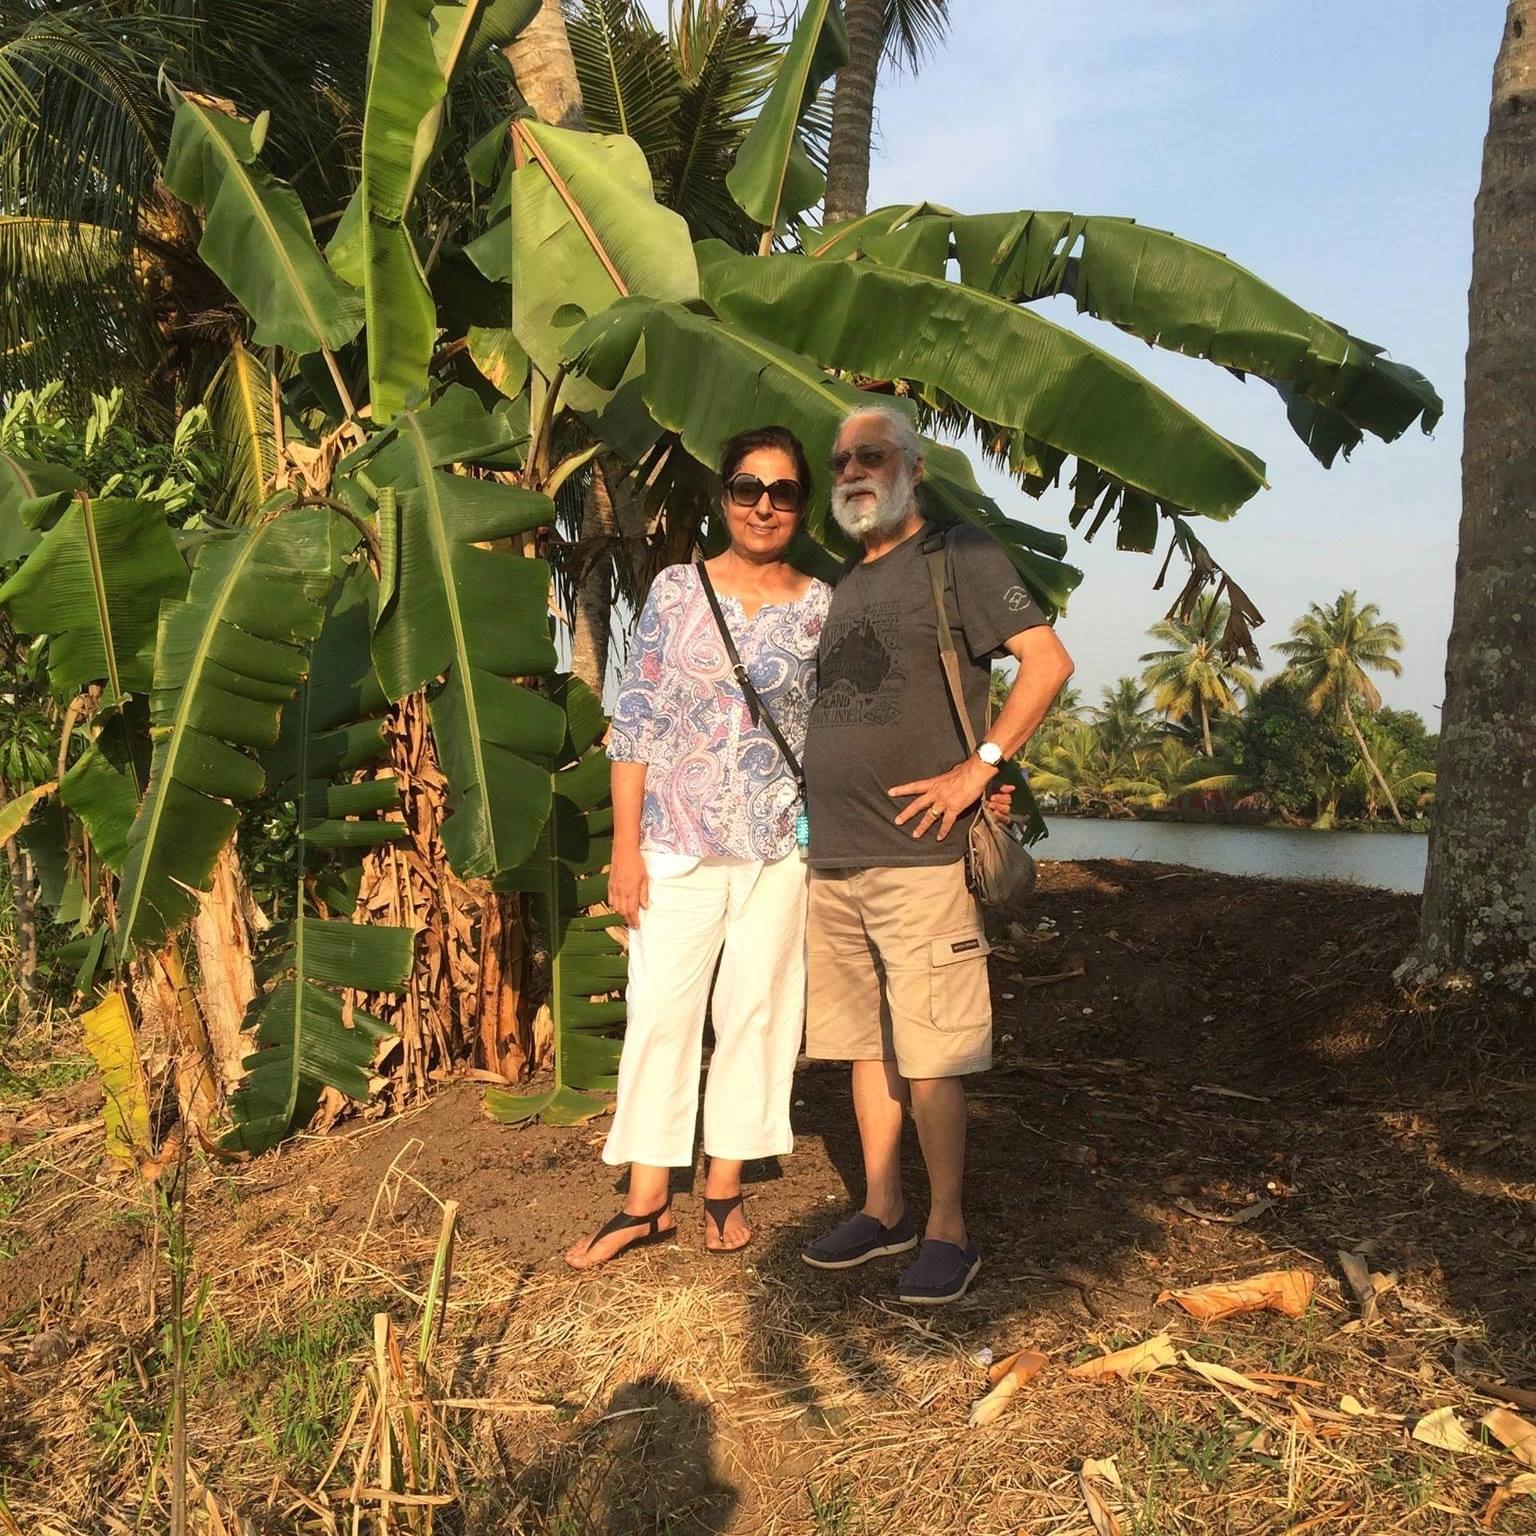 Suksham and Davinder enjoying themselves in Allepey, Kerala